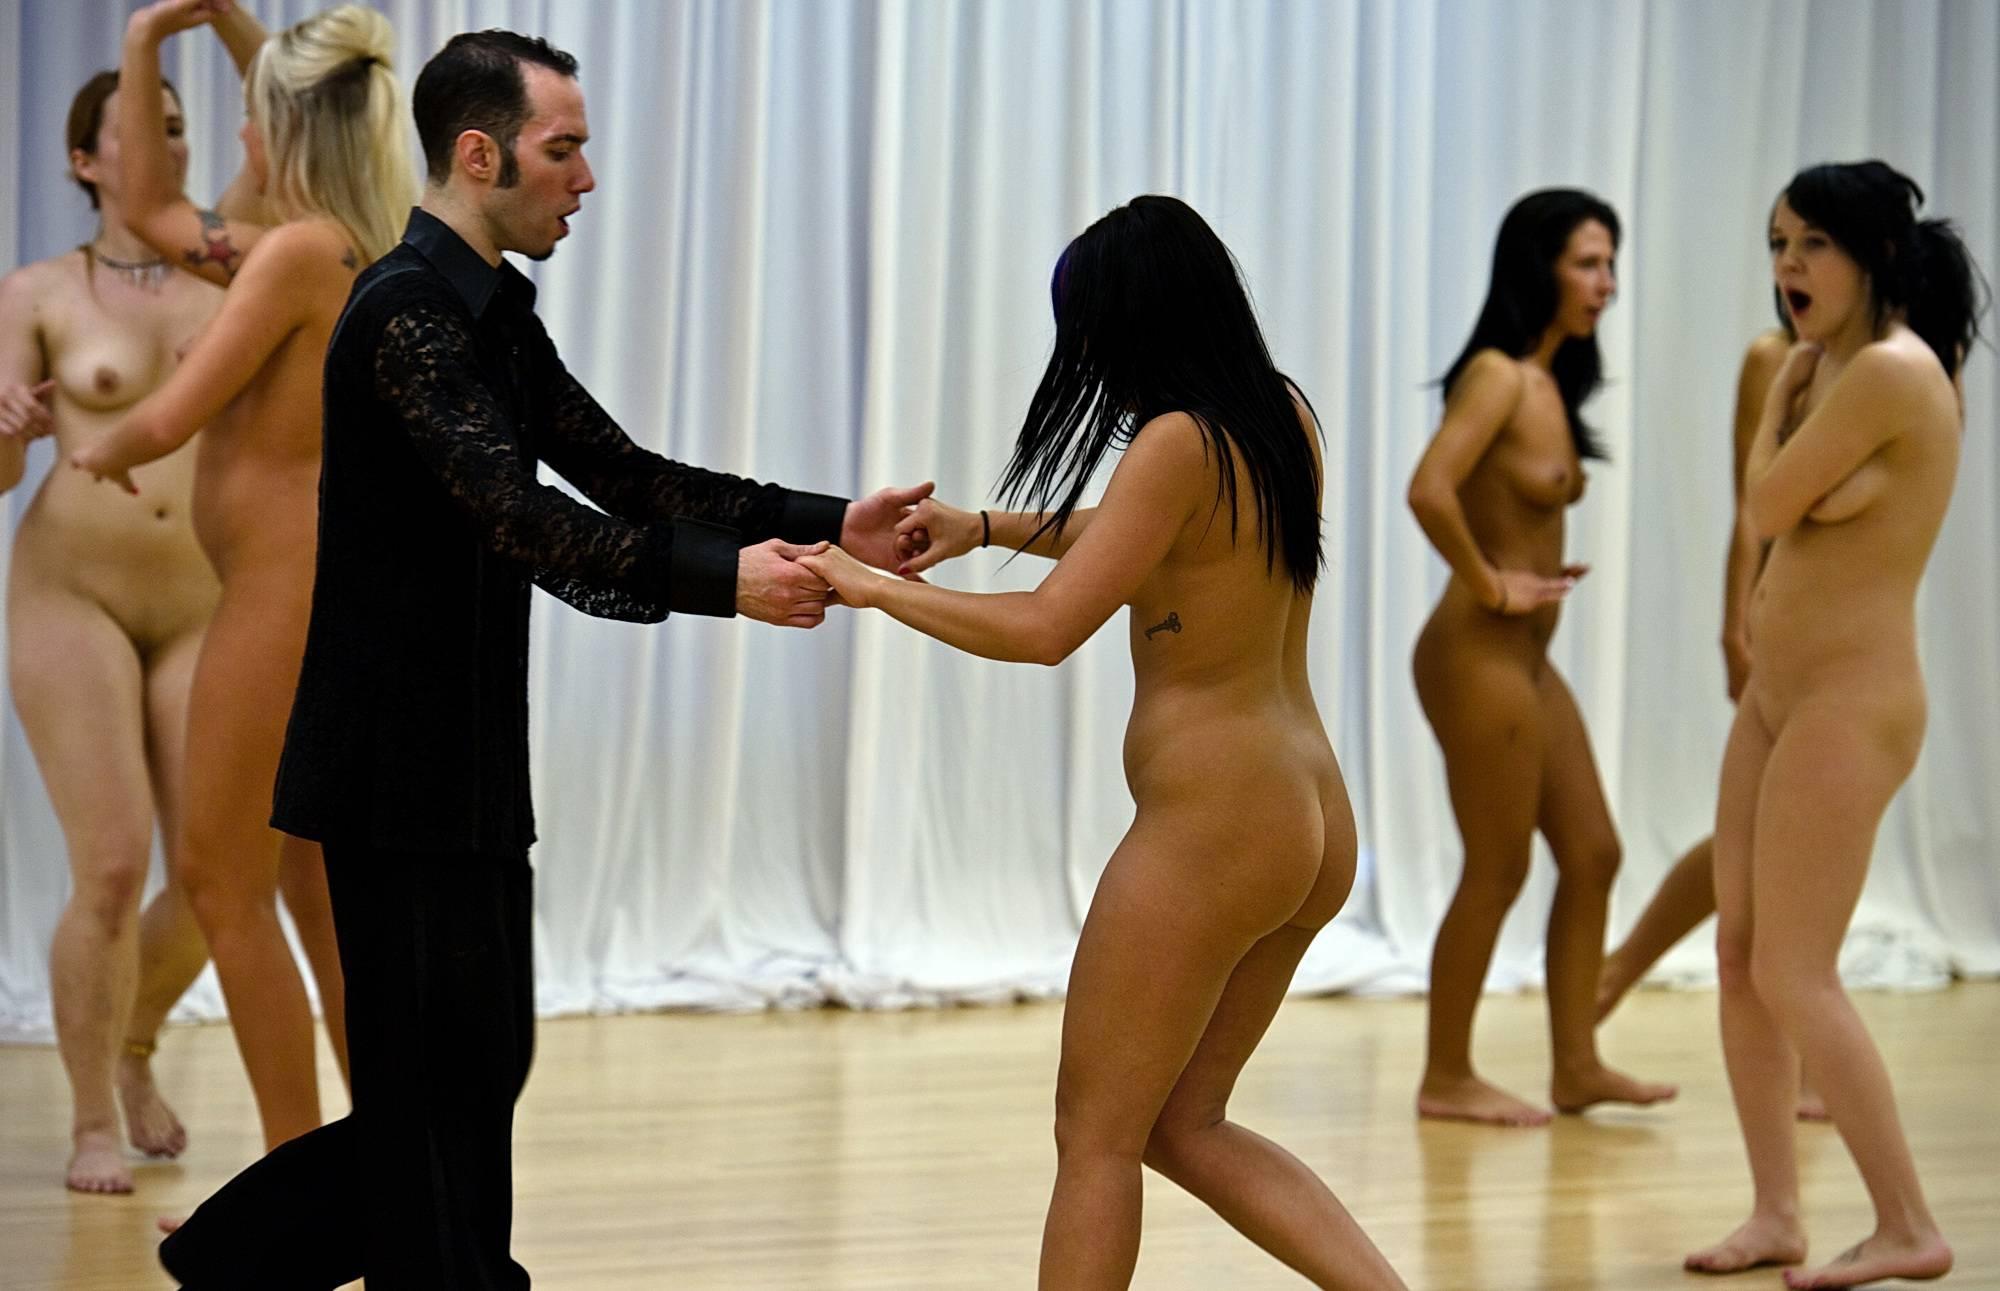 Artful Ballroom Dancing - 2